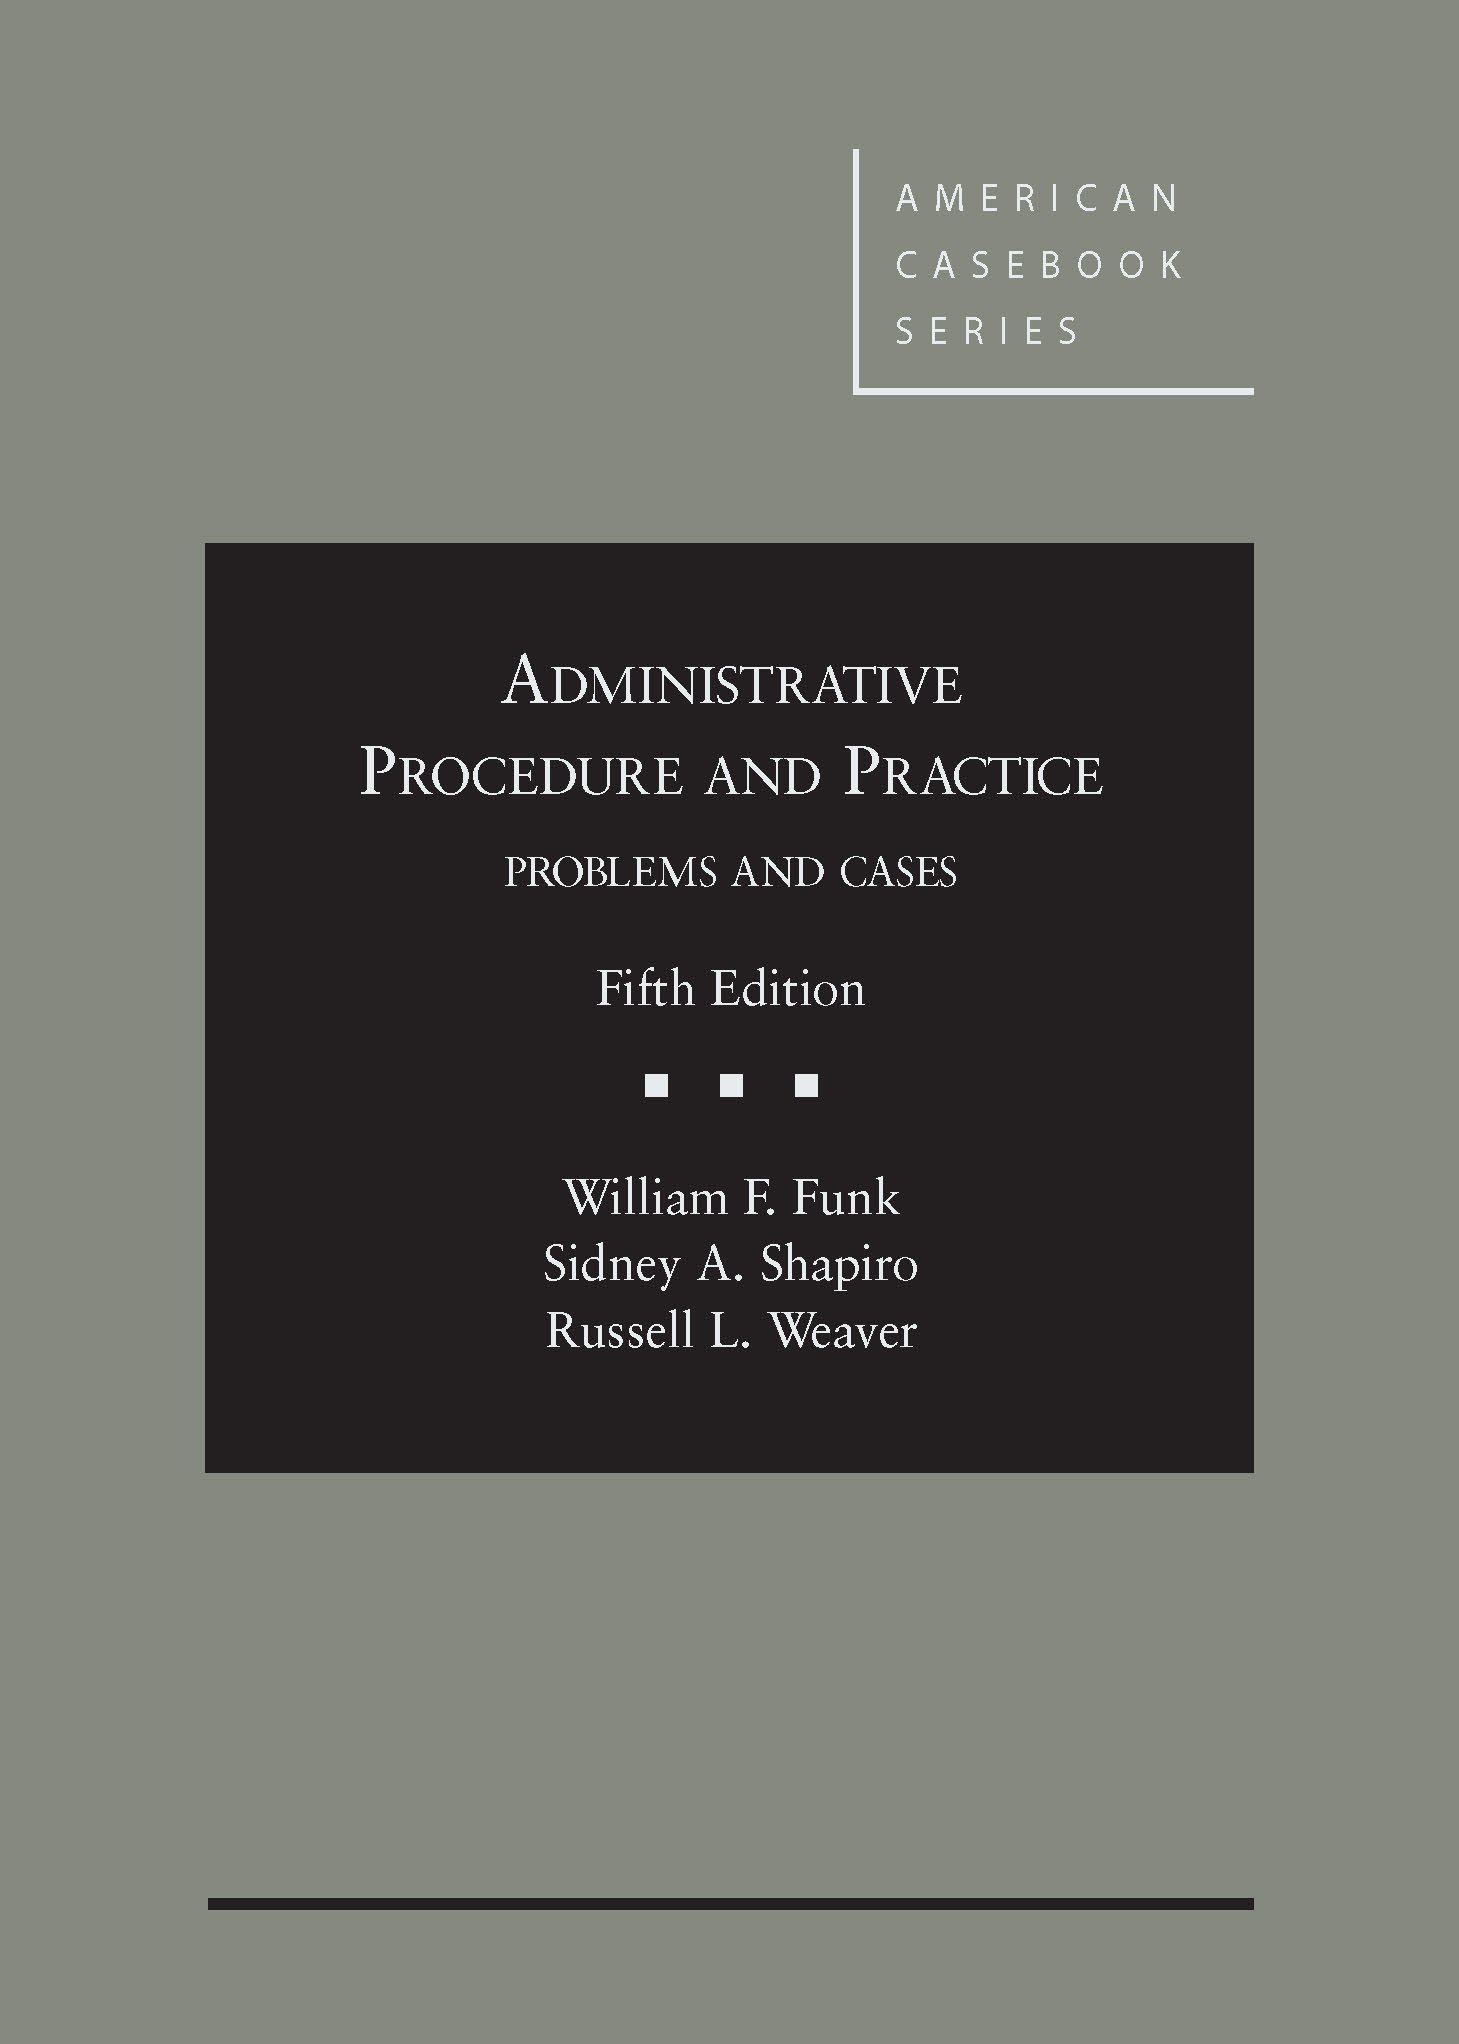 Administrative Procedure and Practice: William Funk, Sidney Shapiro,  Russell Weaver: 9780314286949: Books - Amazon.ca